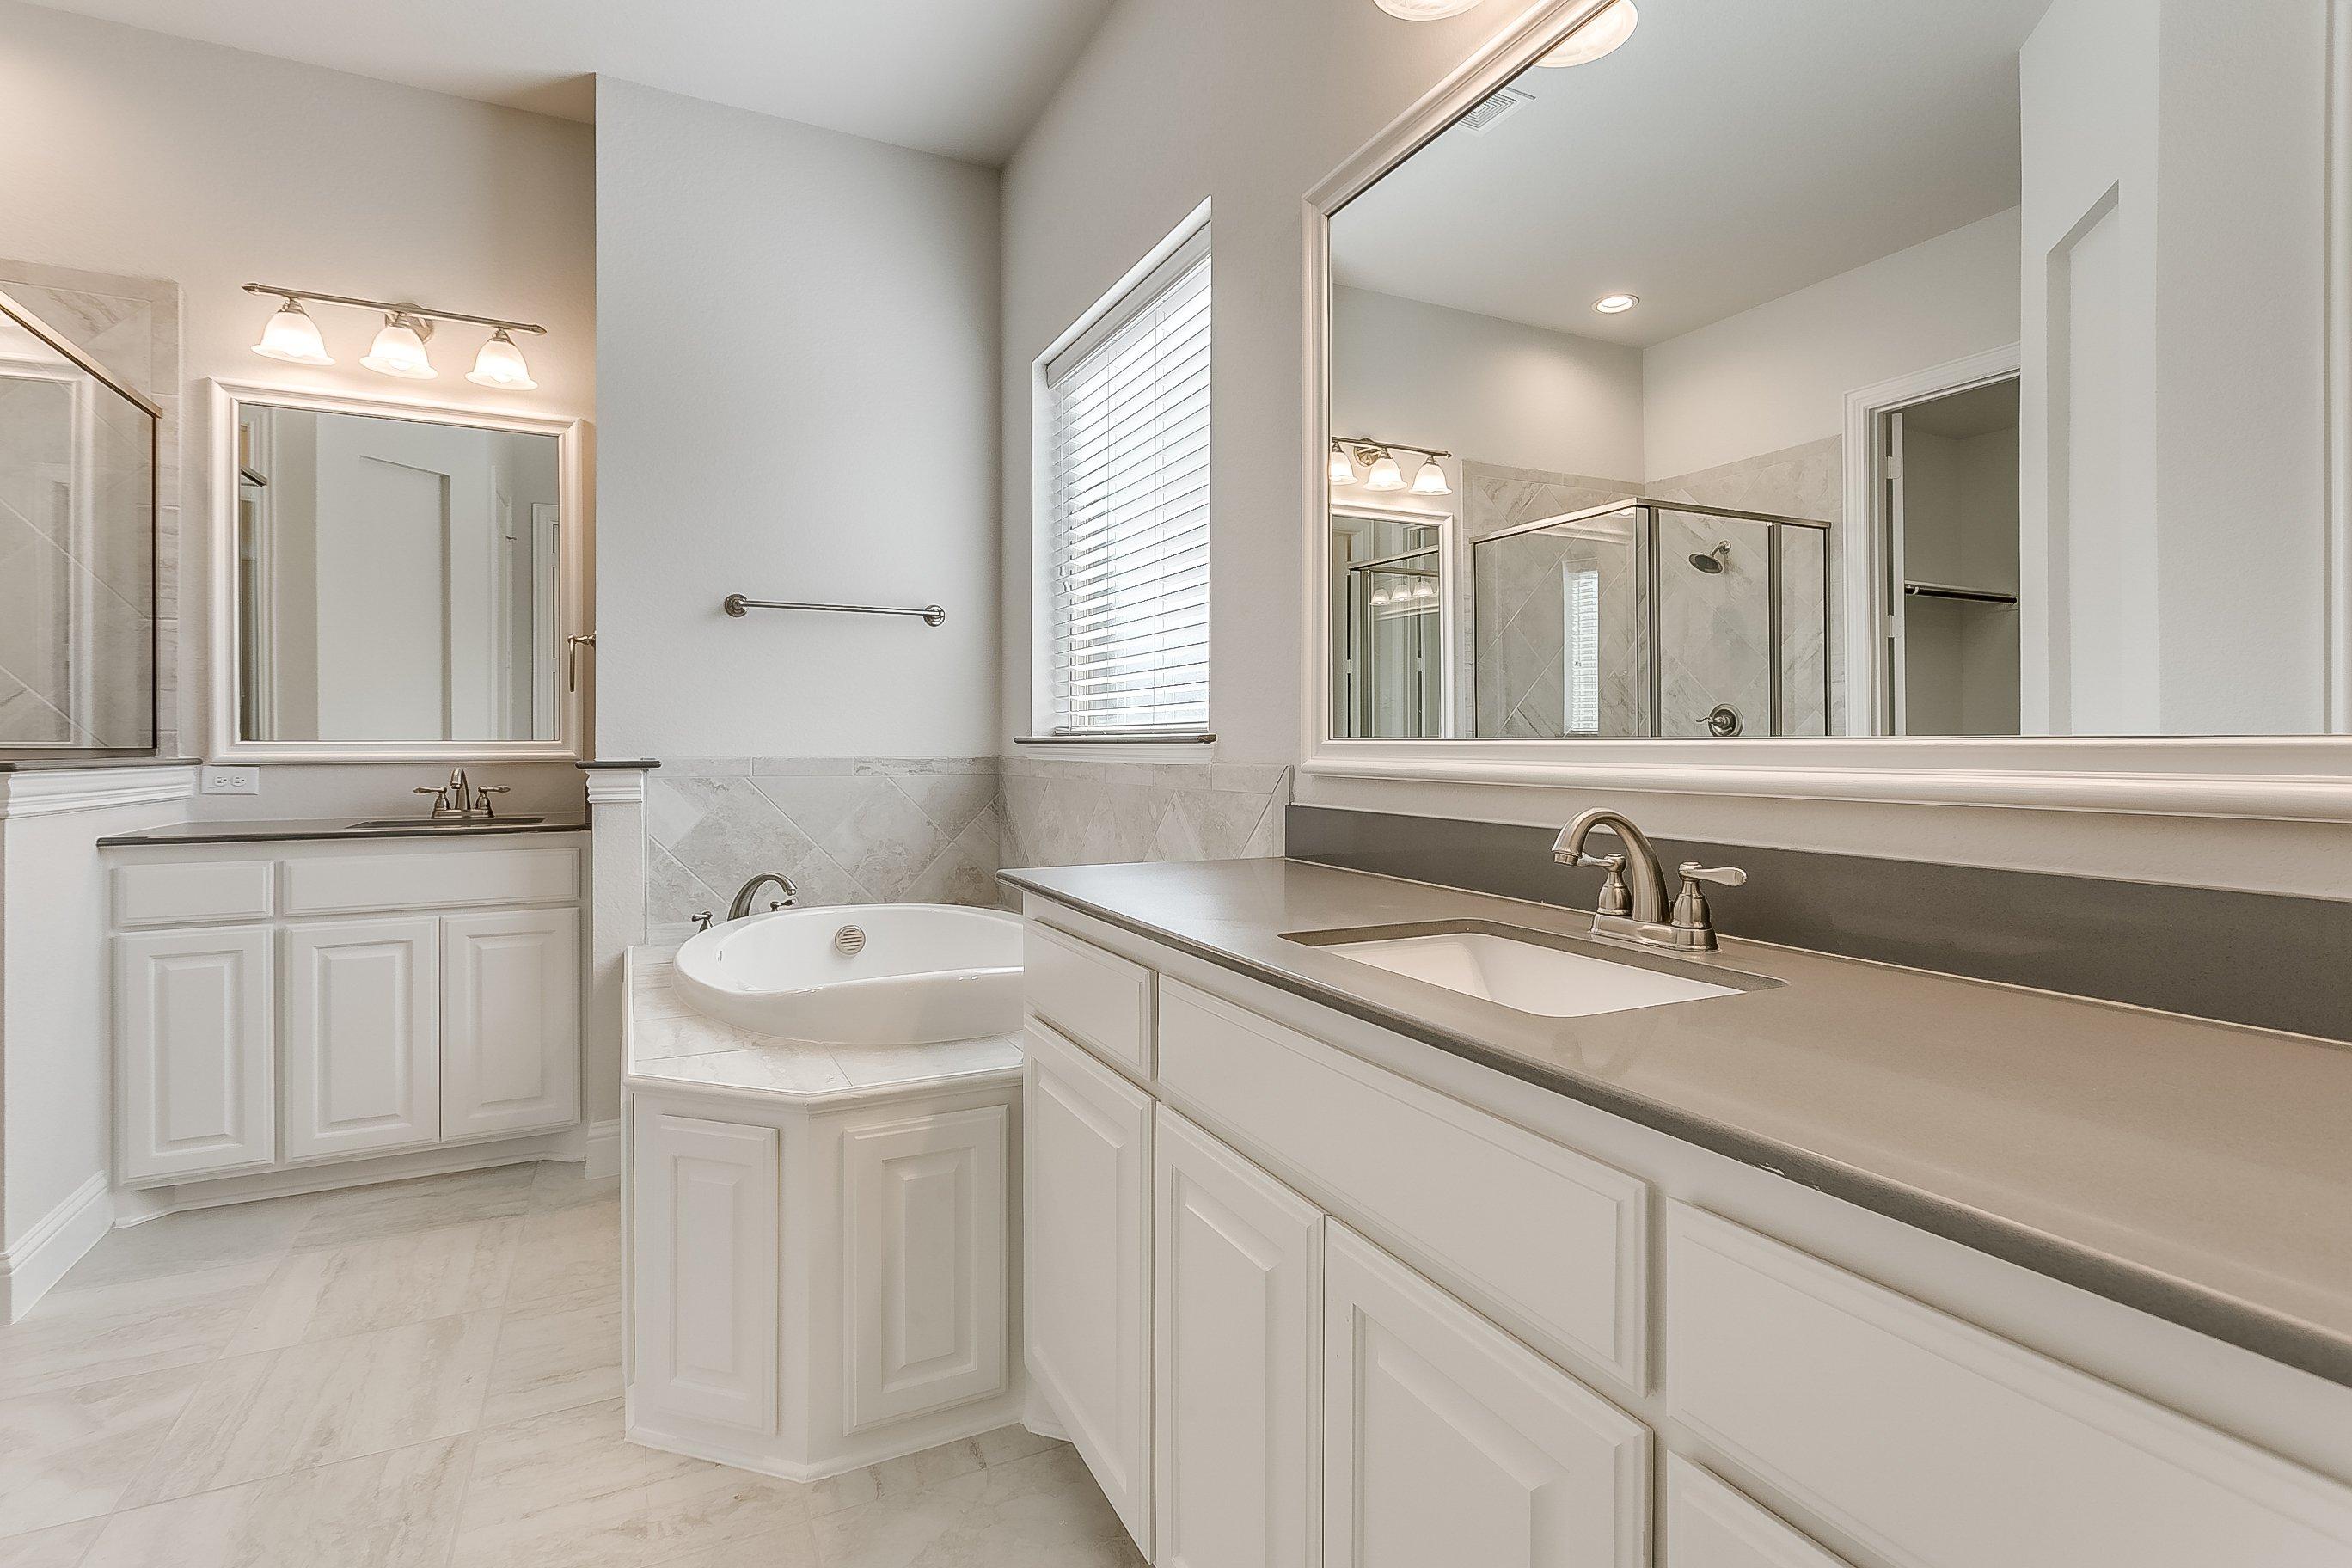 1113 Autumn Trail - John Houston Custom Homes - Master Suite, Master Bathroom, Quartz Countertops, Grey Bathroom, White Cabinets, His and Hers Sinks